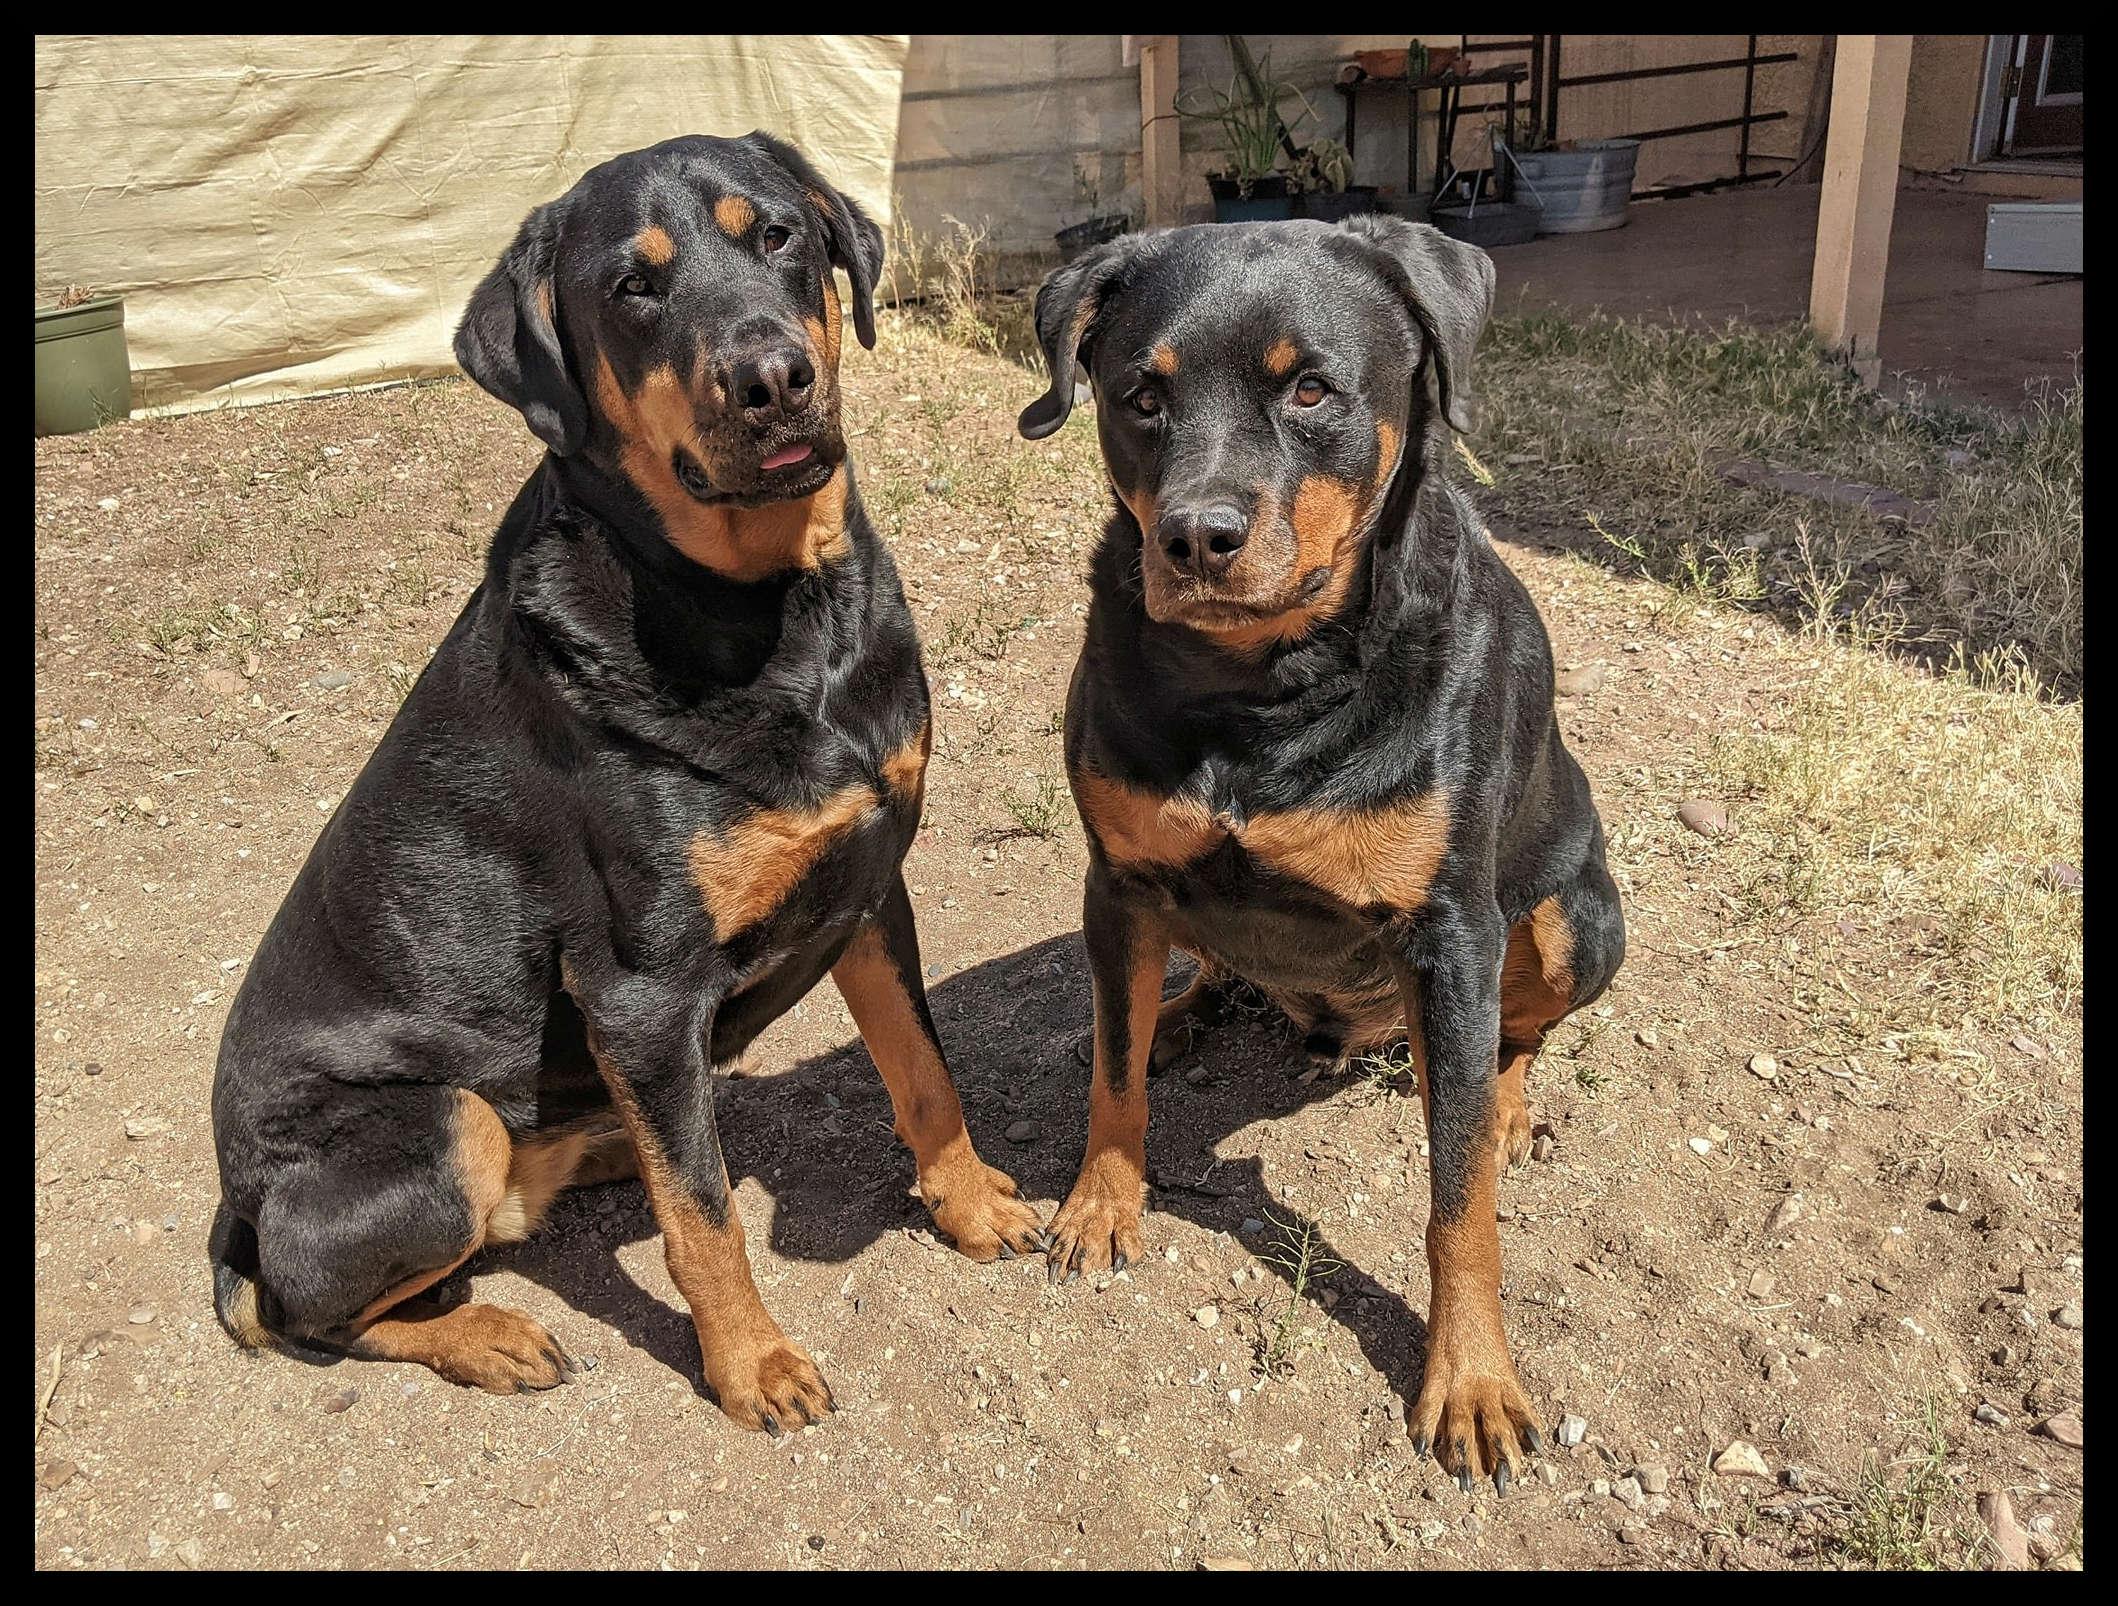 Freya Rottweiler on left, Baldur Rottweiler on the right sitting next to each other in dirt backyard